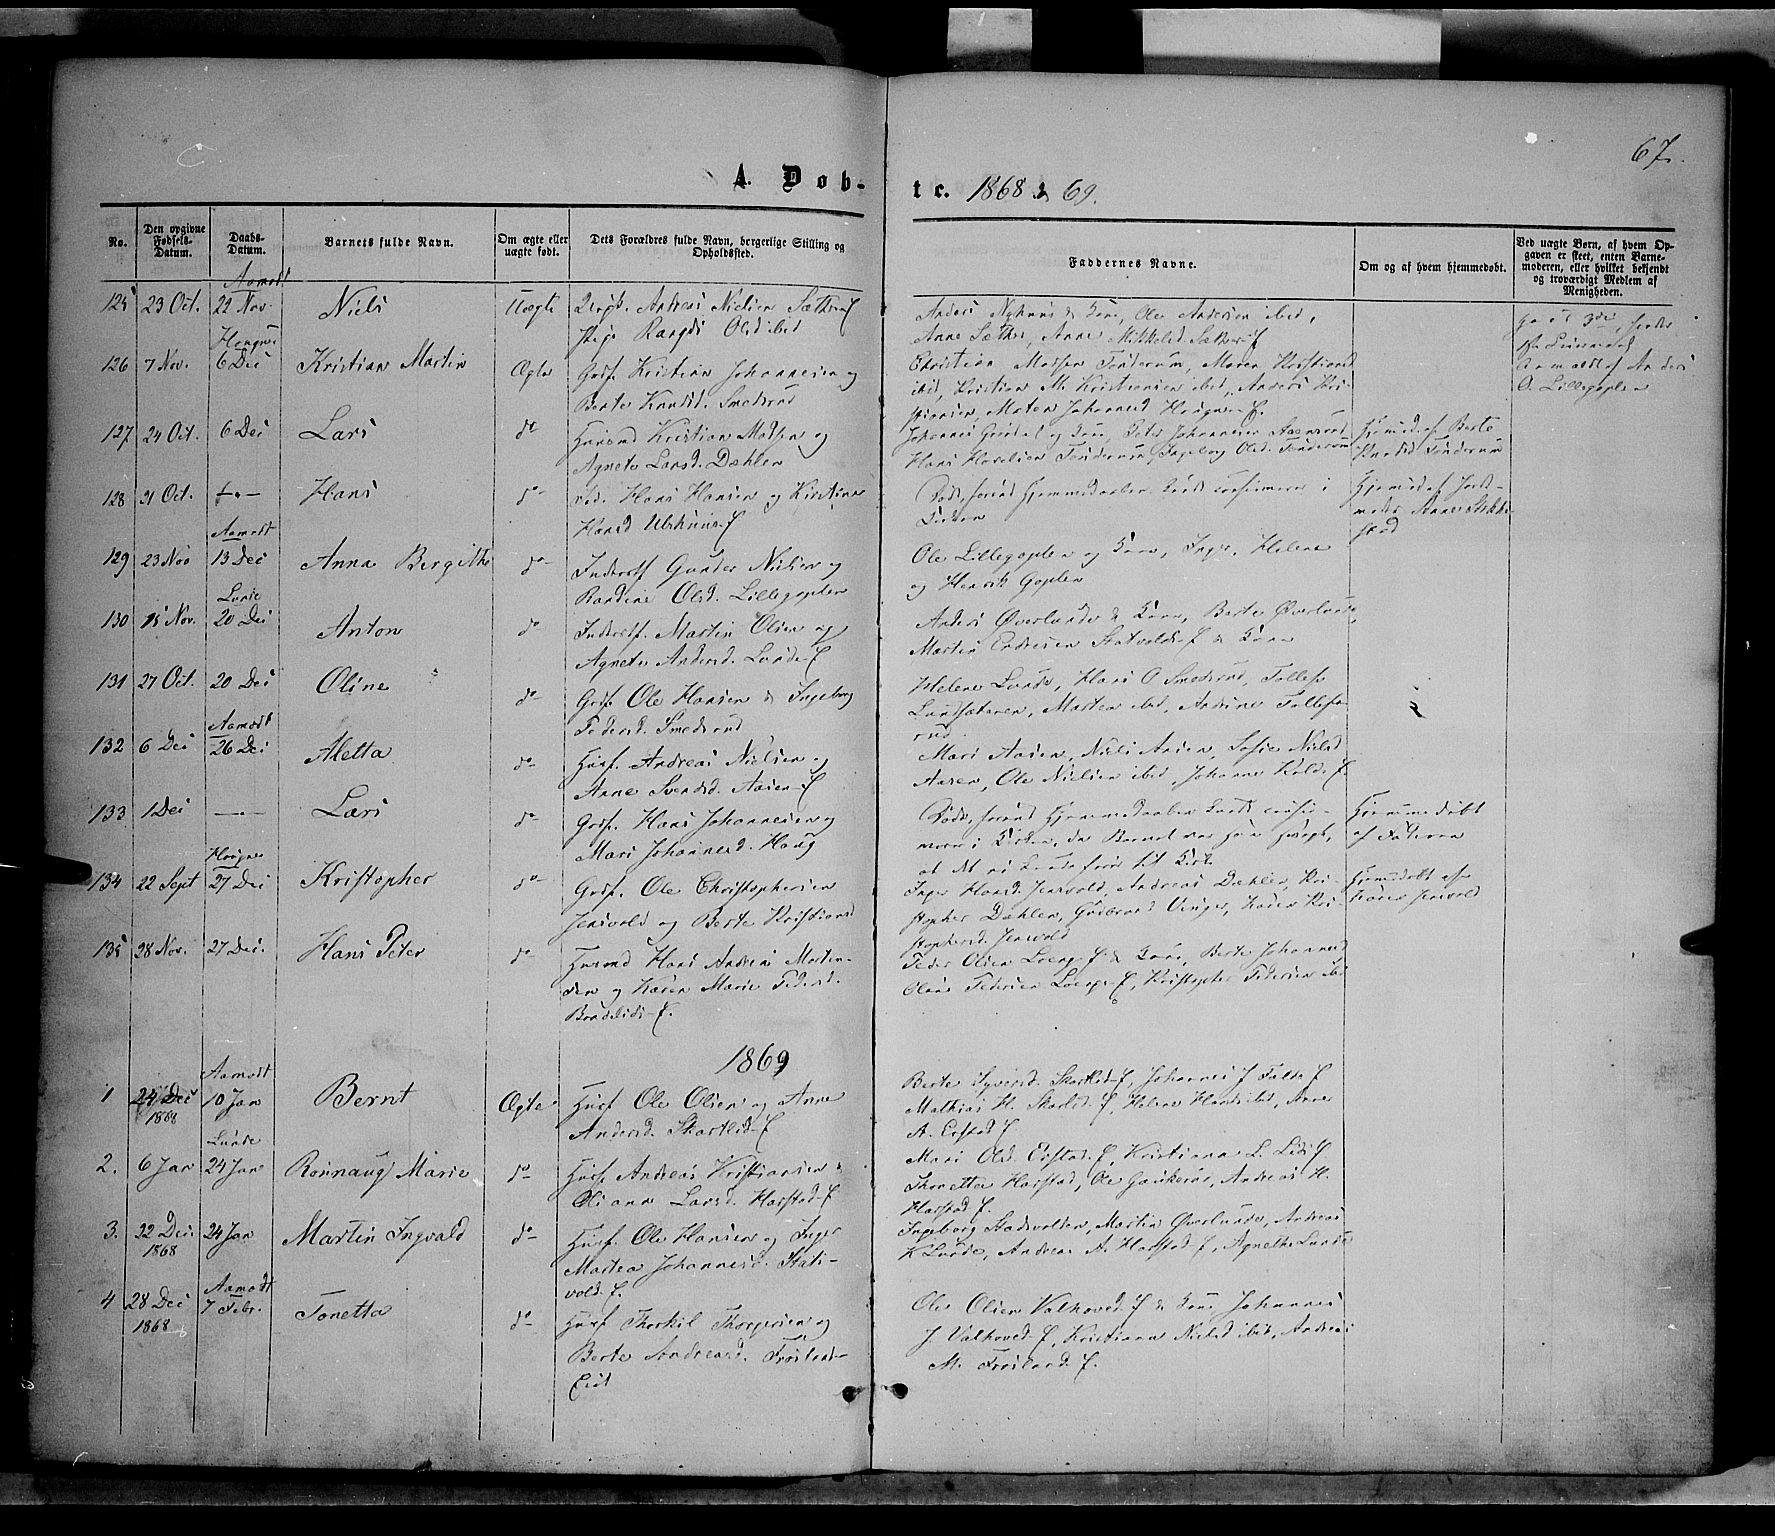 SAH, Nordre Land prestekontor, Ministerialbok nr. 1, 1860-1871, s. 67